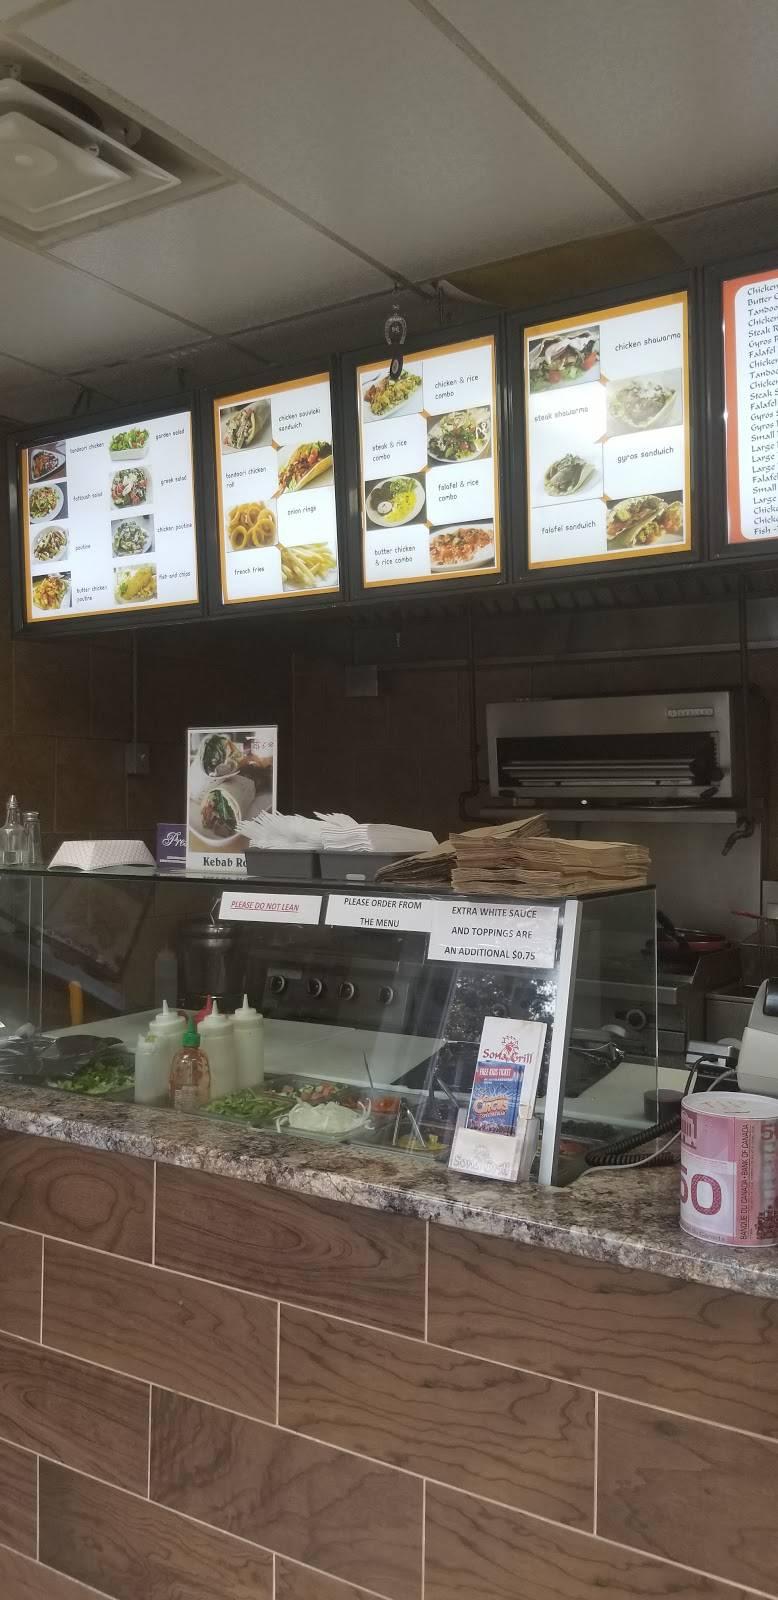 Sona Grill | restaurant | 1015 Cedarwood Pl, Burlington, ON L7T 3J4, Canada | 9056392020 OR +1 905-639-2020